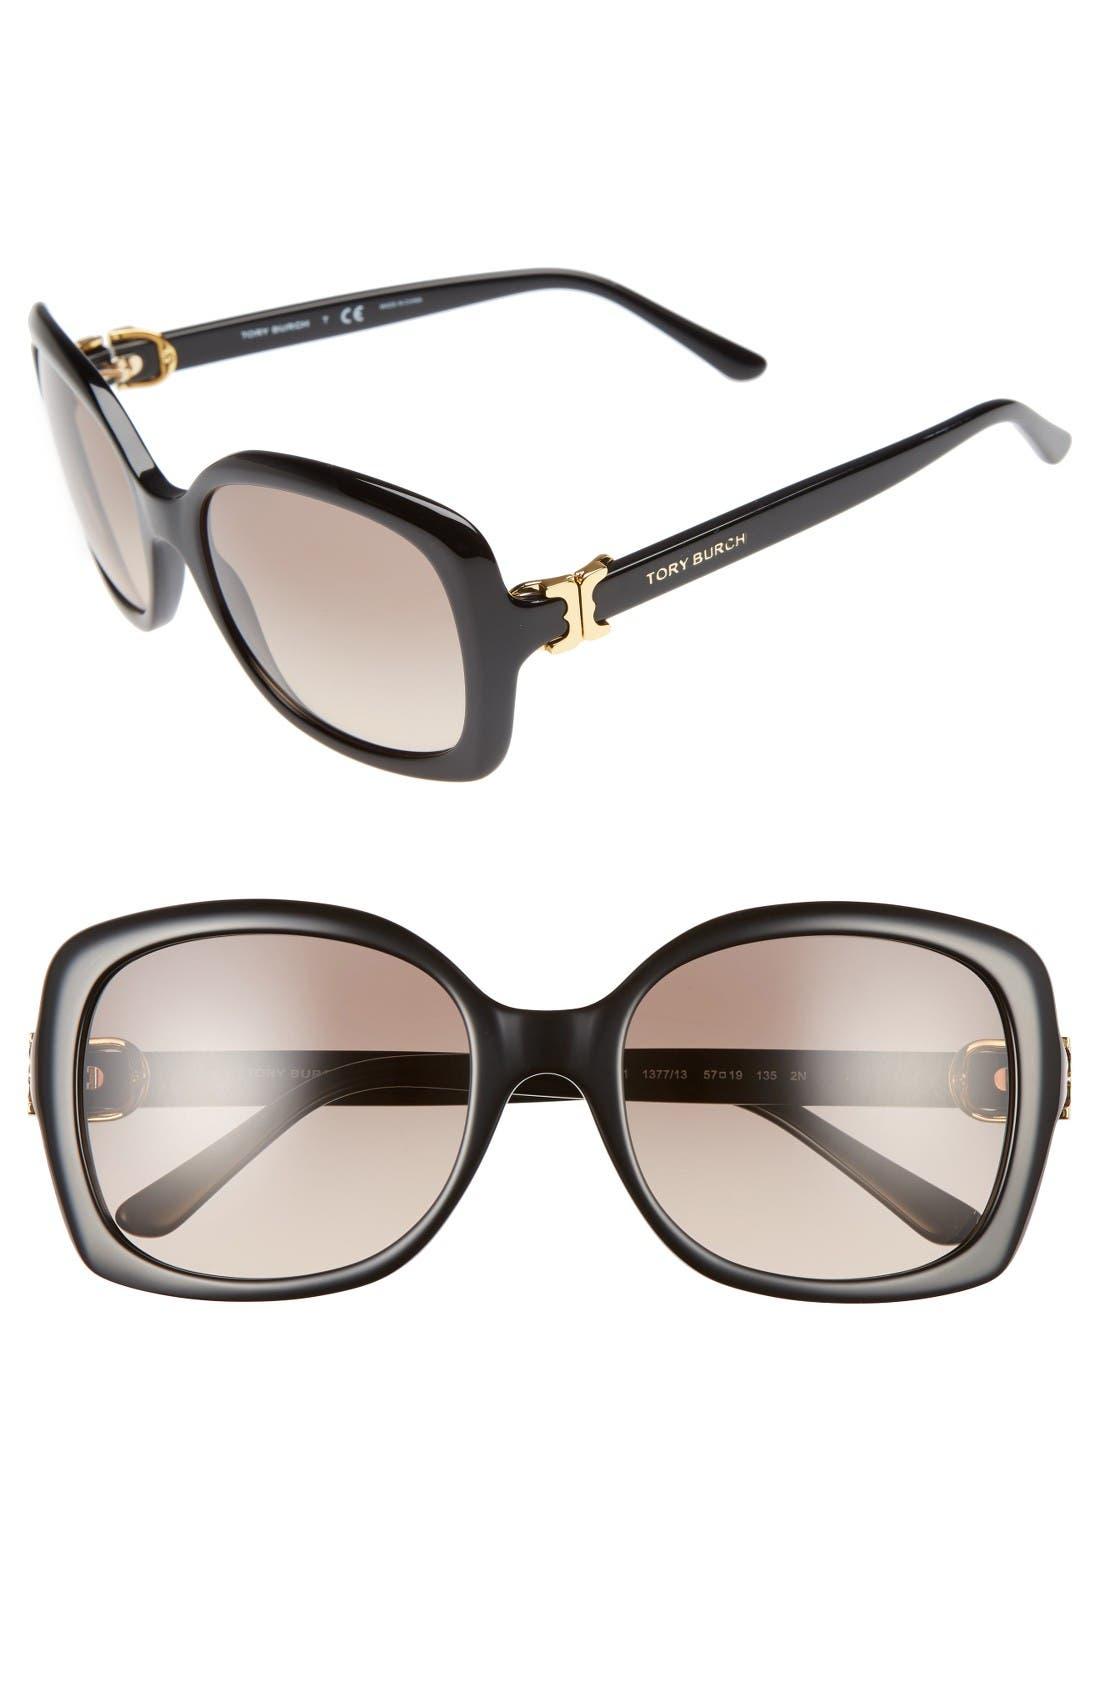 57mm Oversized Sunglasses,                             Main thumbnail 1, color,                             Black